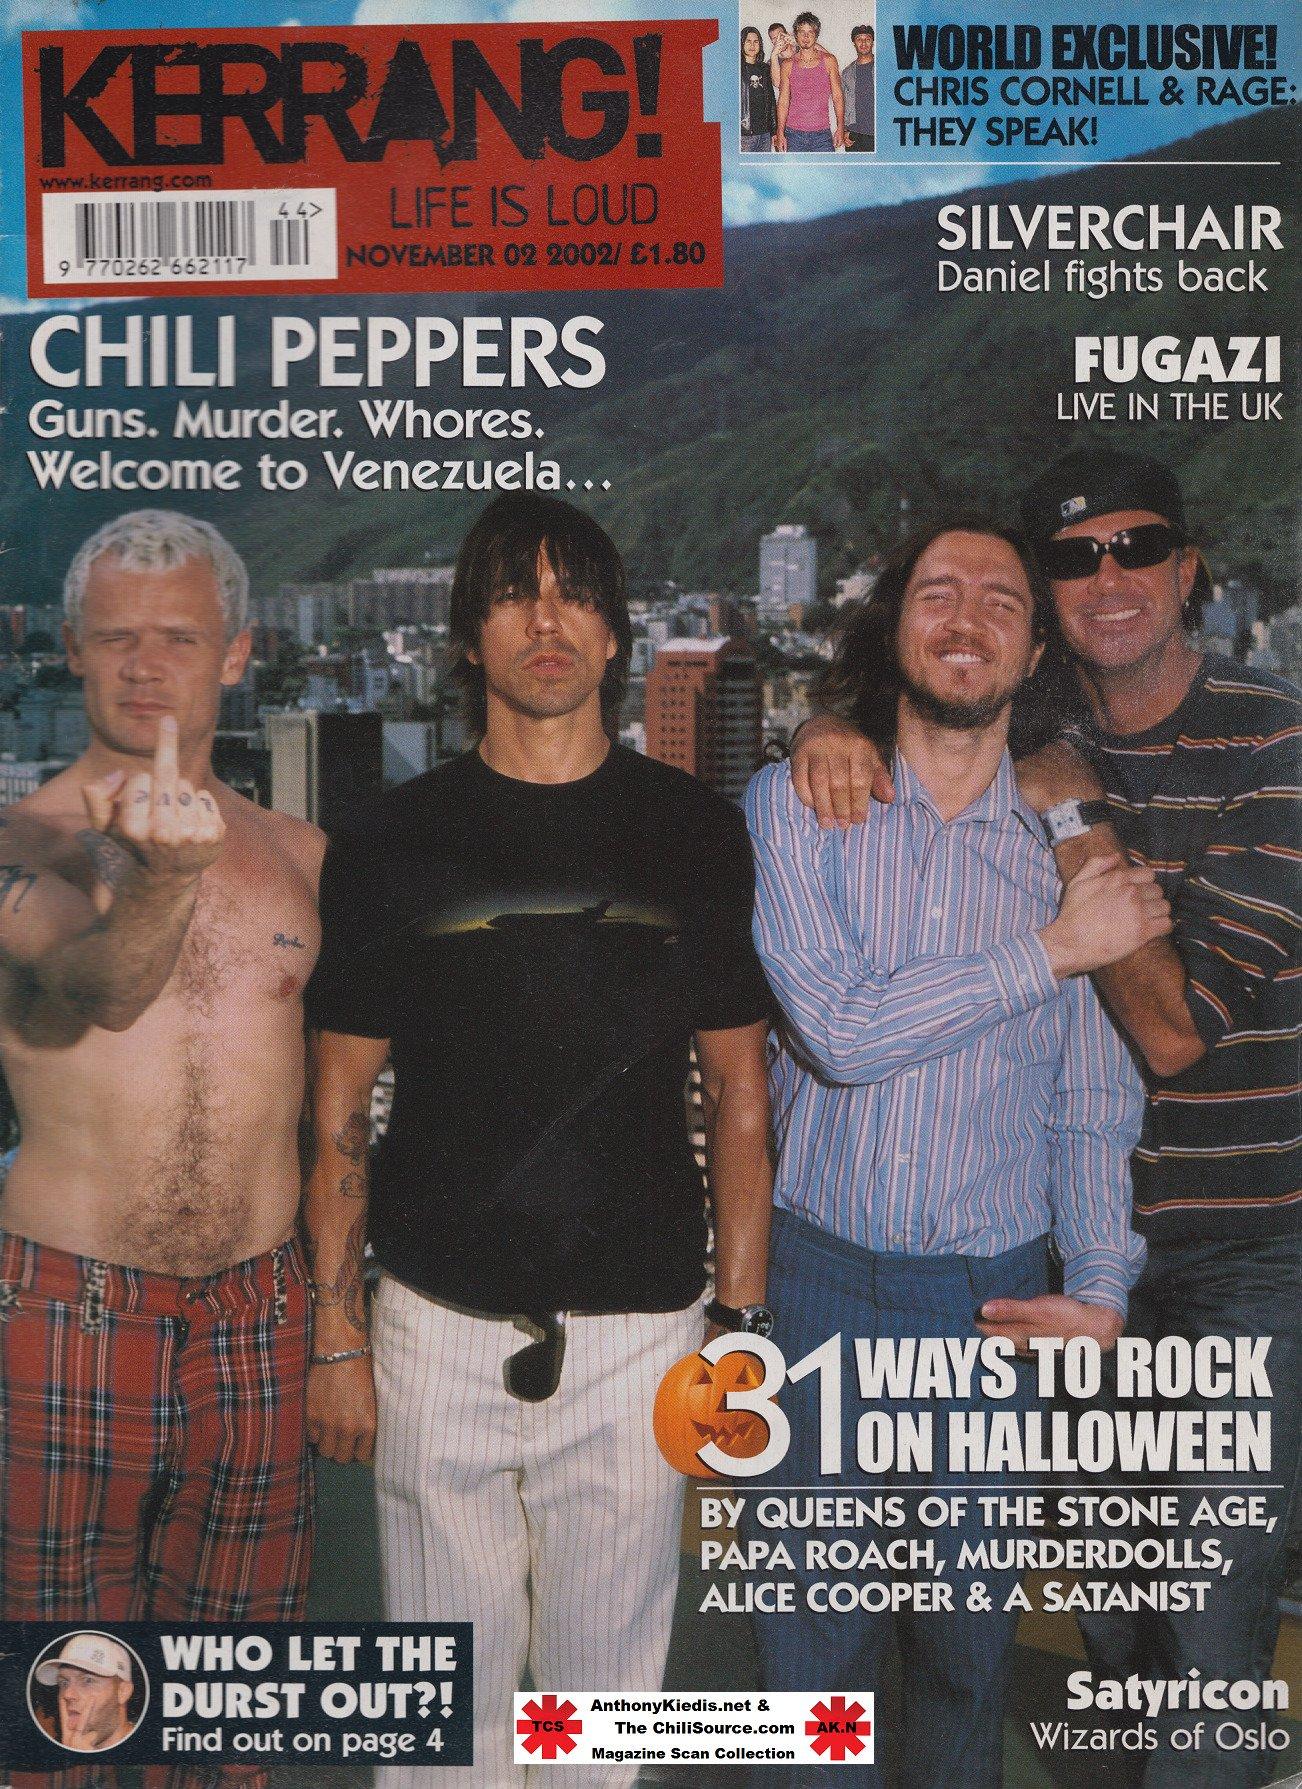 Portada de la revista británica @KerrangMagazine, 2 de noviembre de 2002